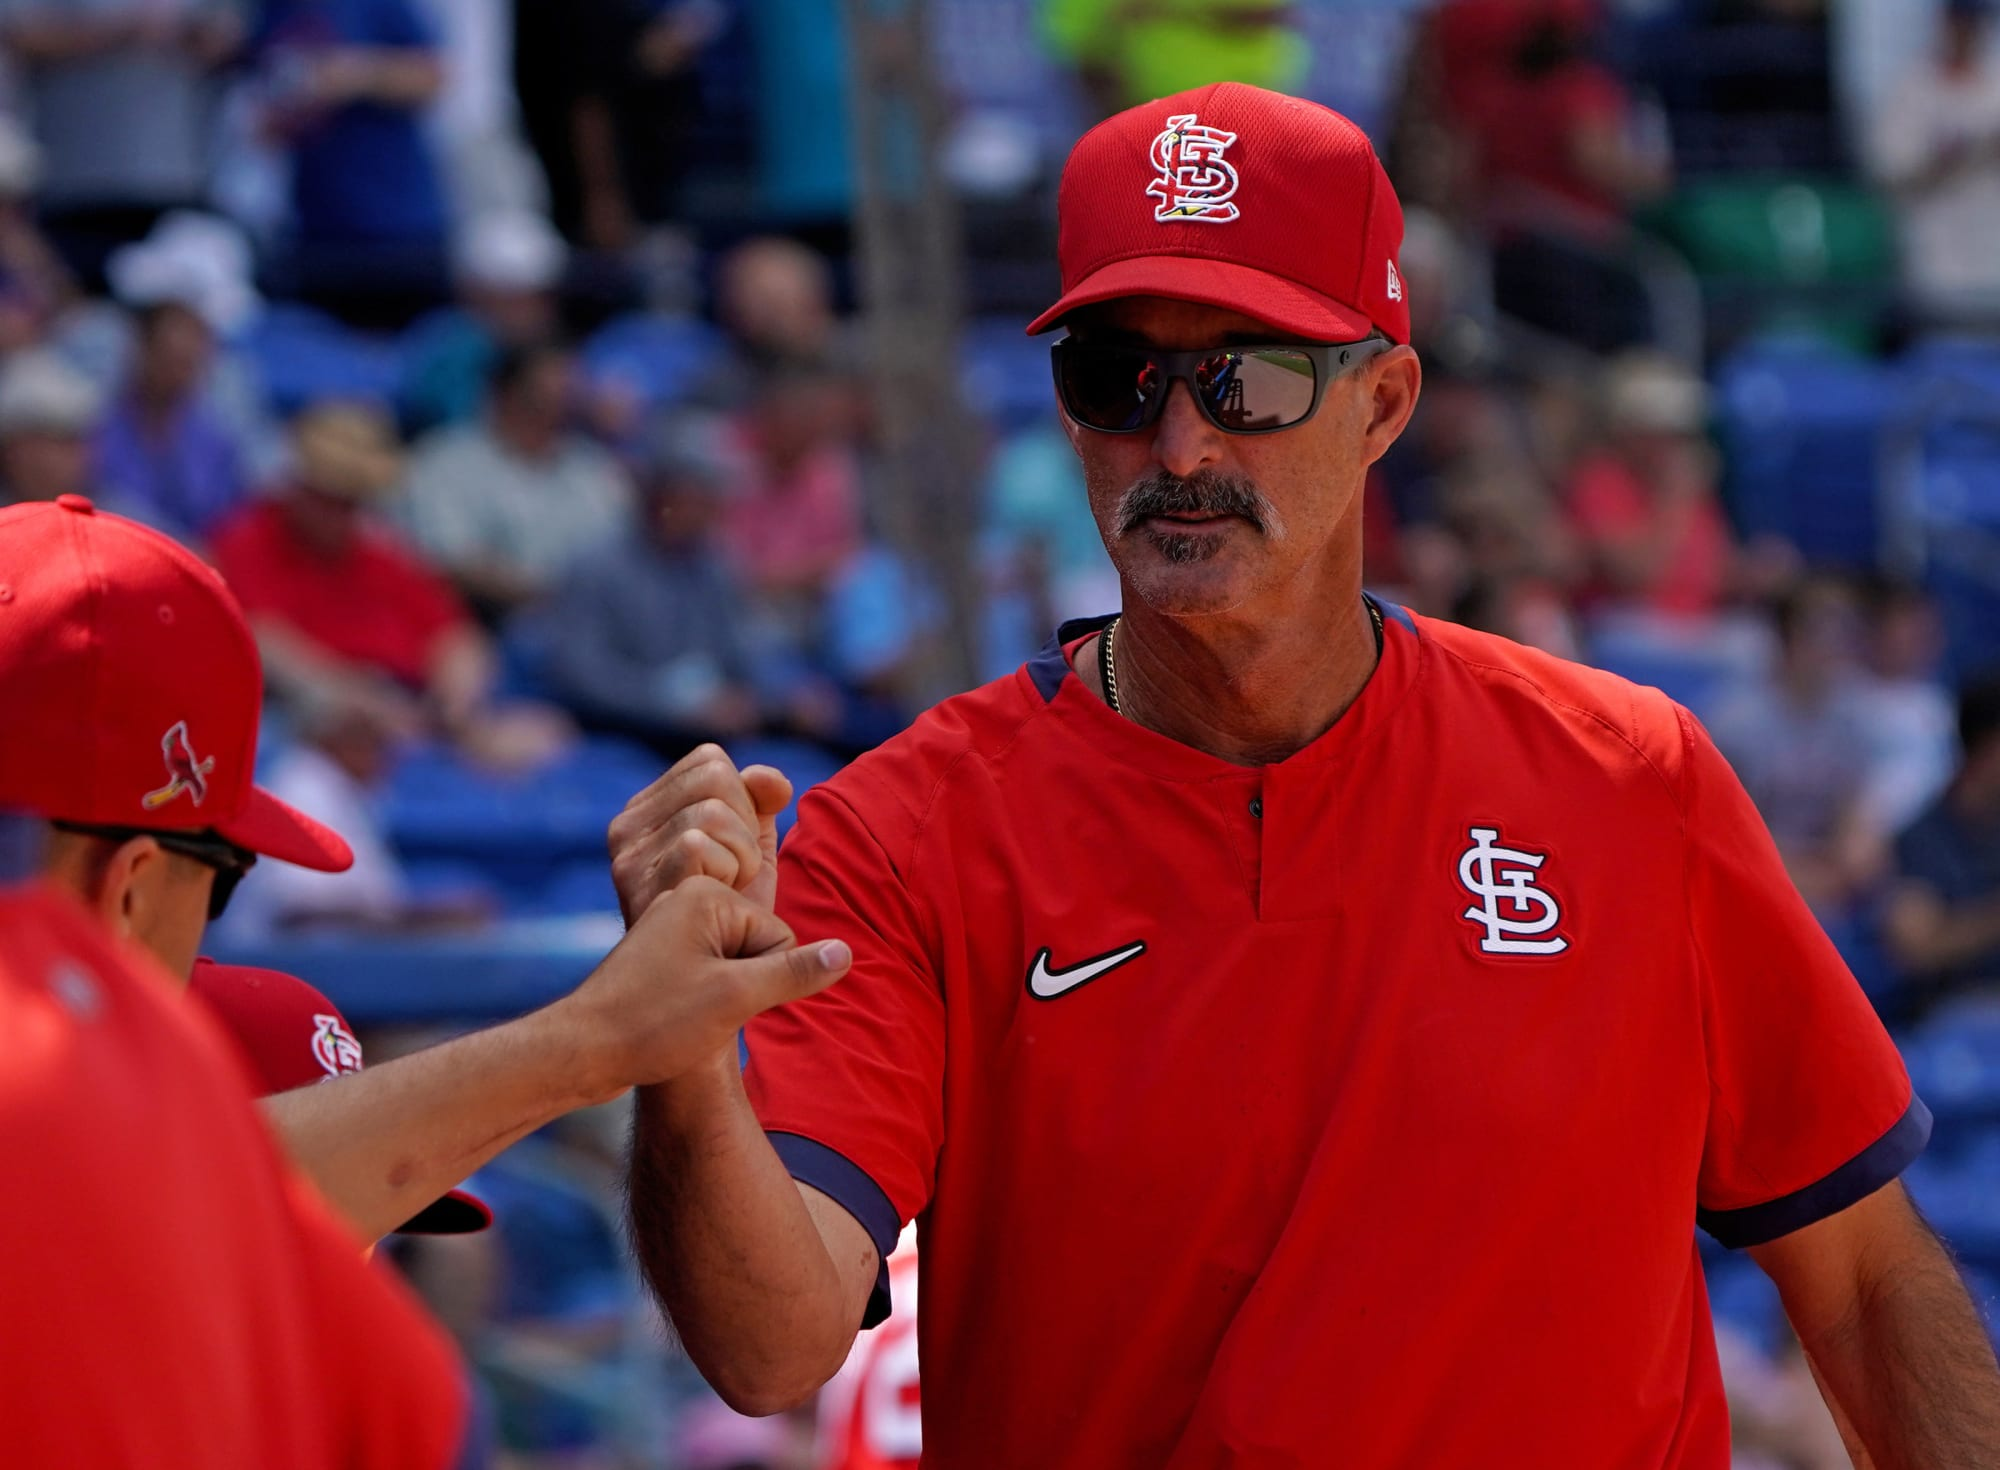 St. Louis Cardinals News: Albert, Maddux among coaches back for 2021